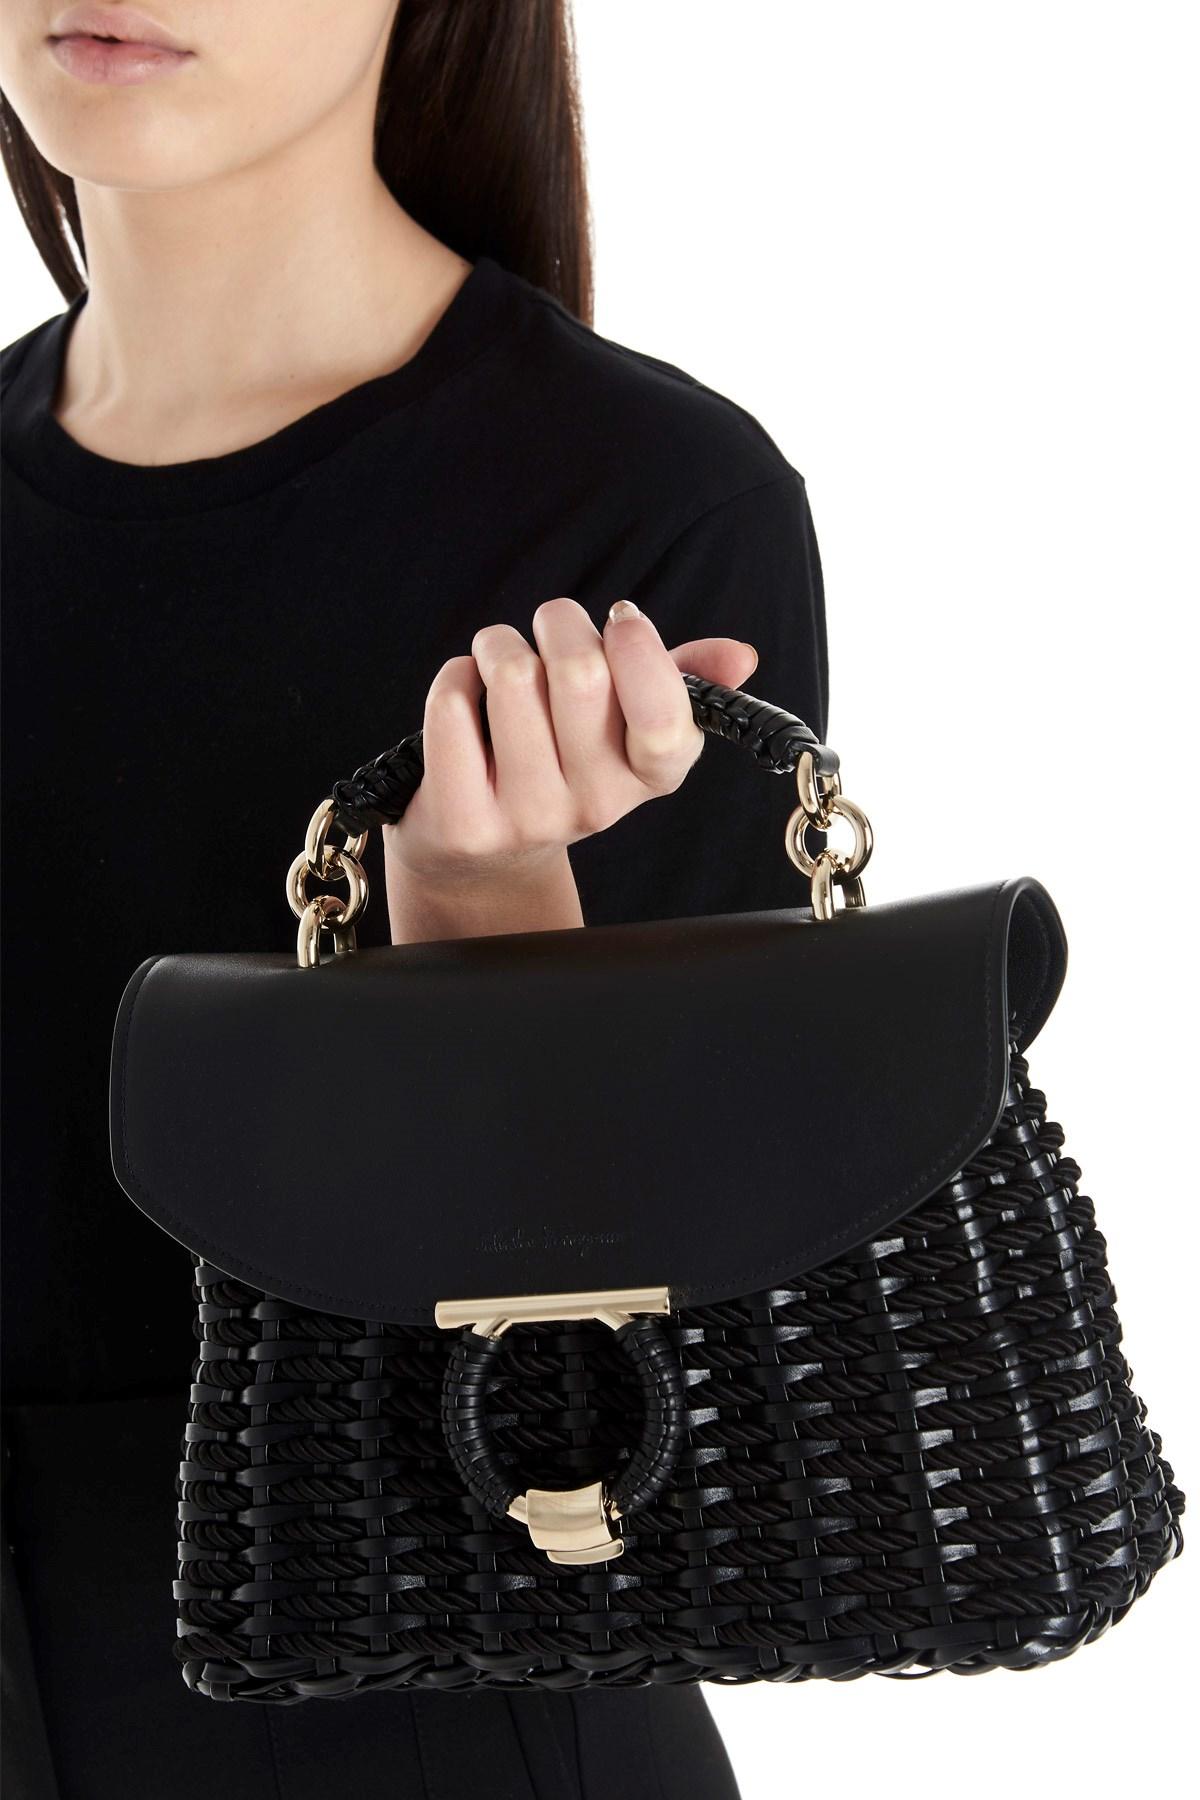 salvatore ferragamo 'Margot' hand bag available on www.julian ...